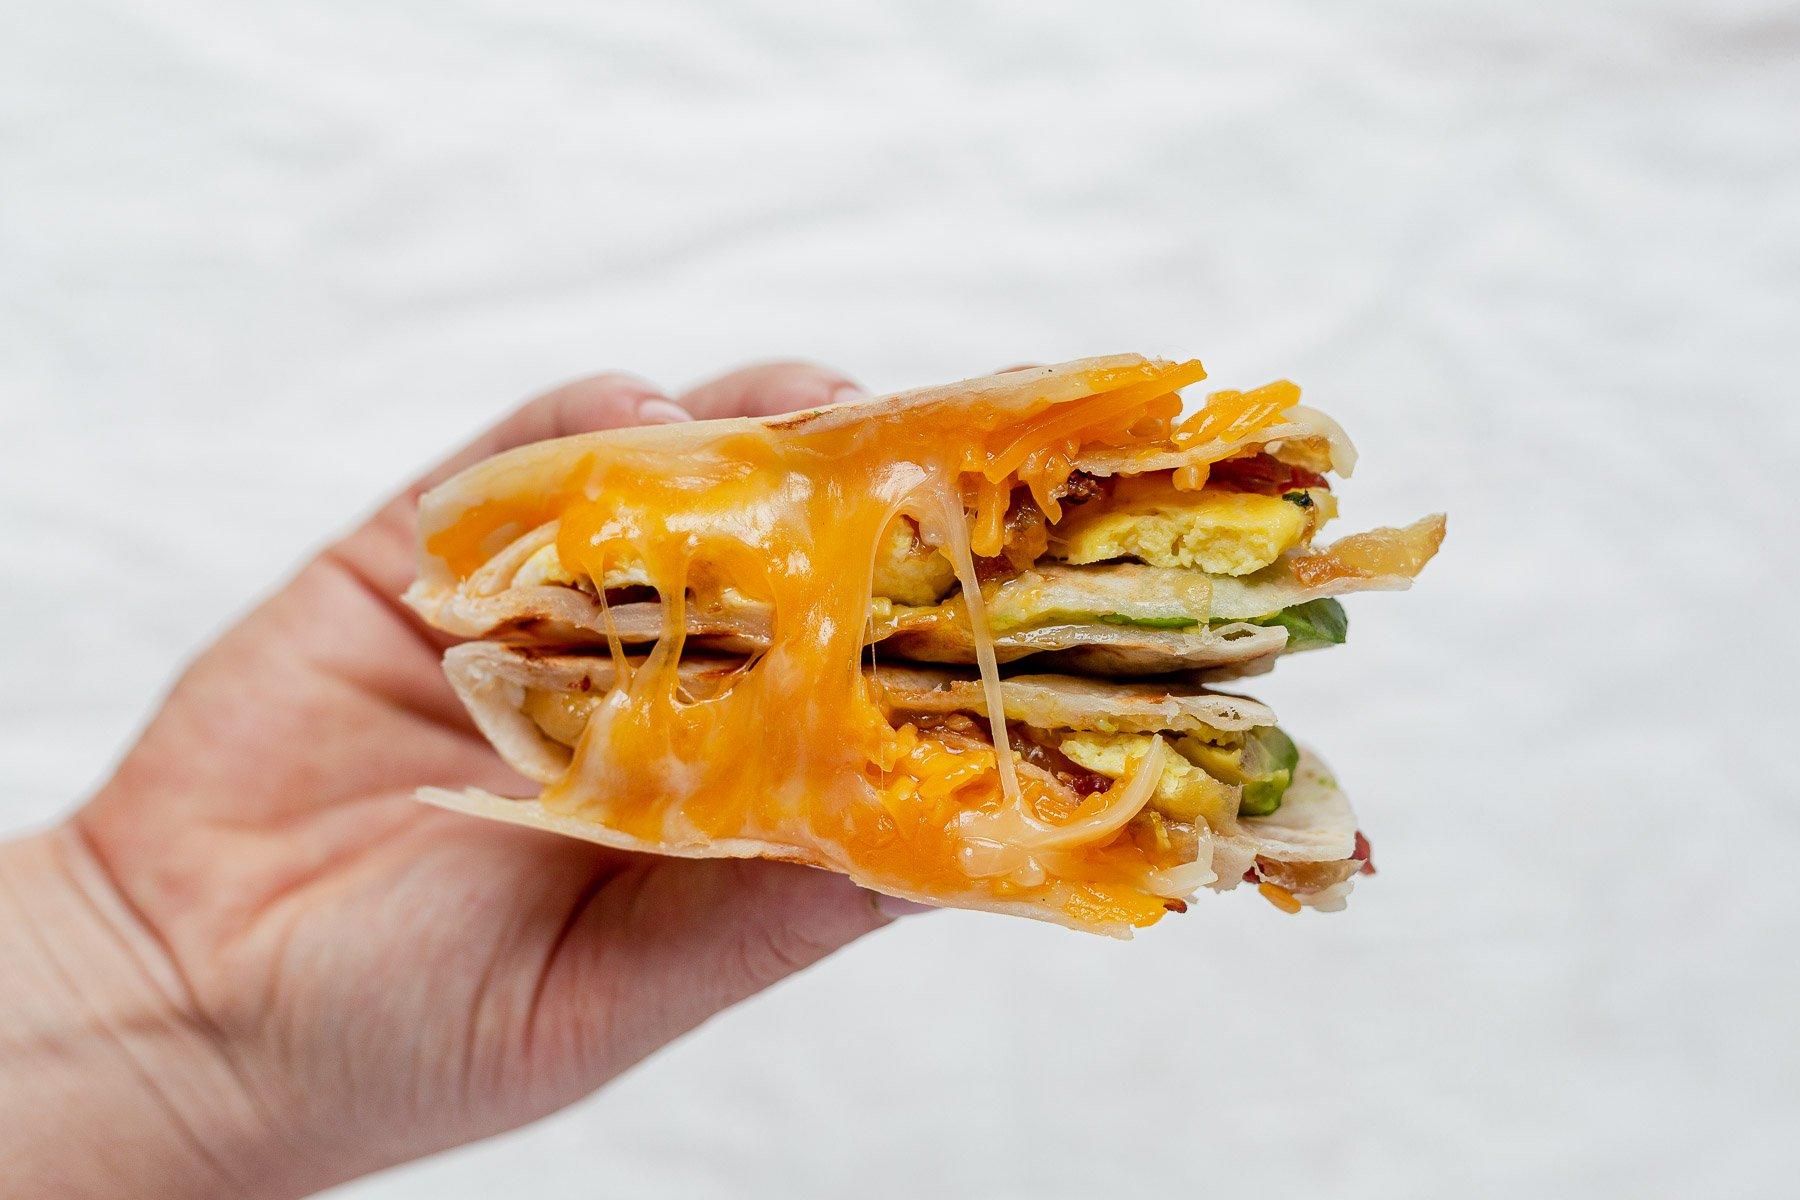 hand holding a cheesy breakfast quesadilla cut in half